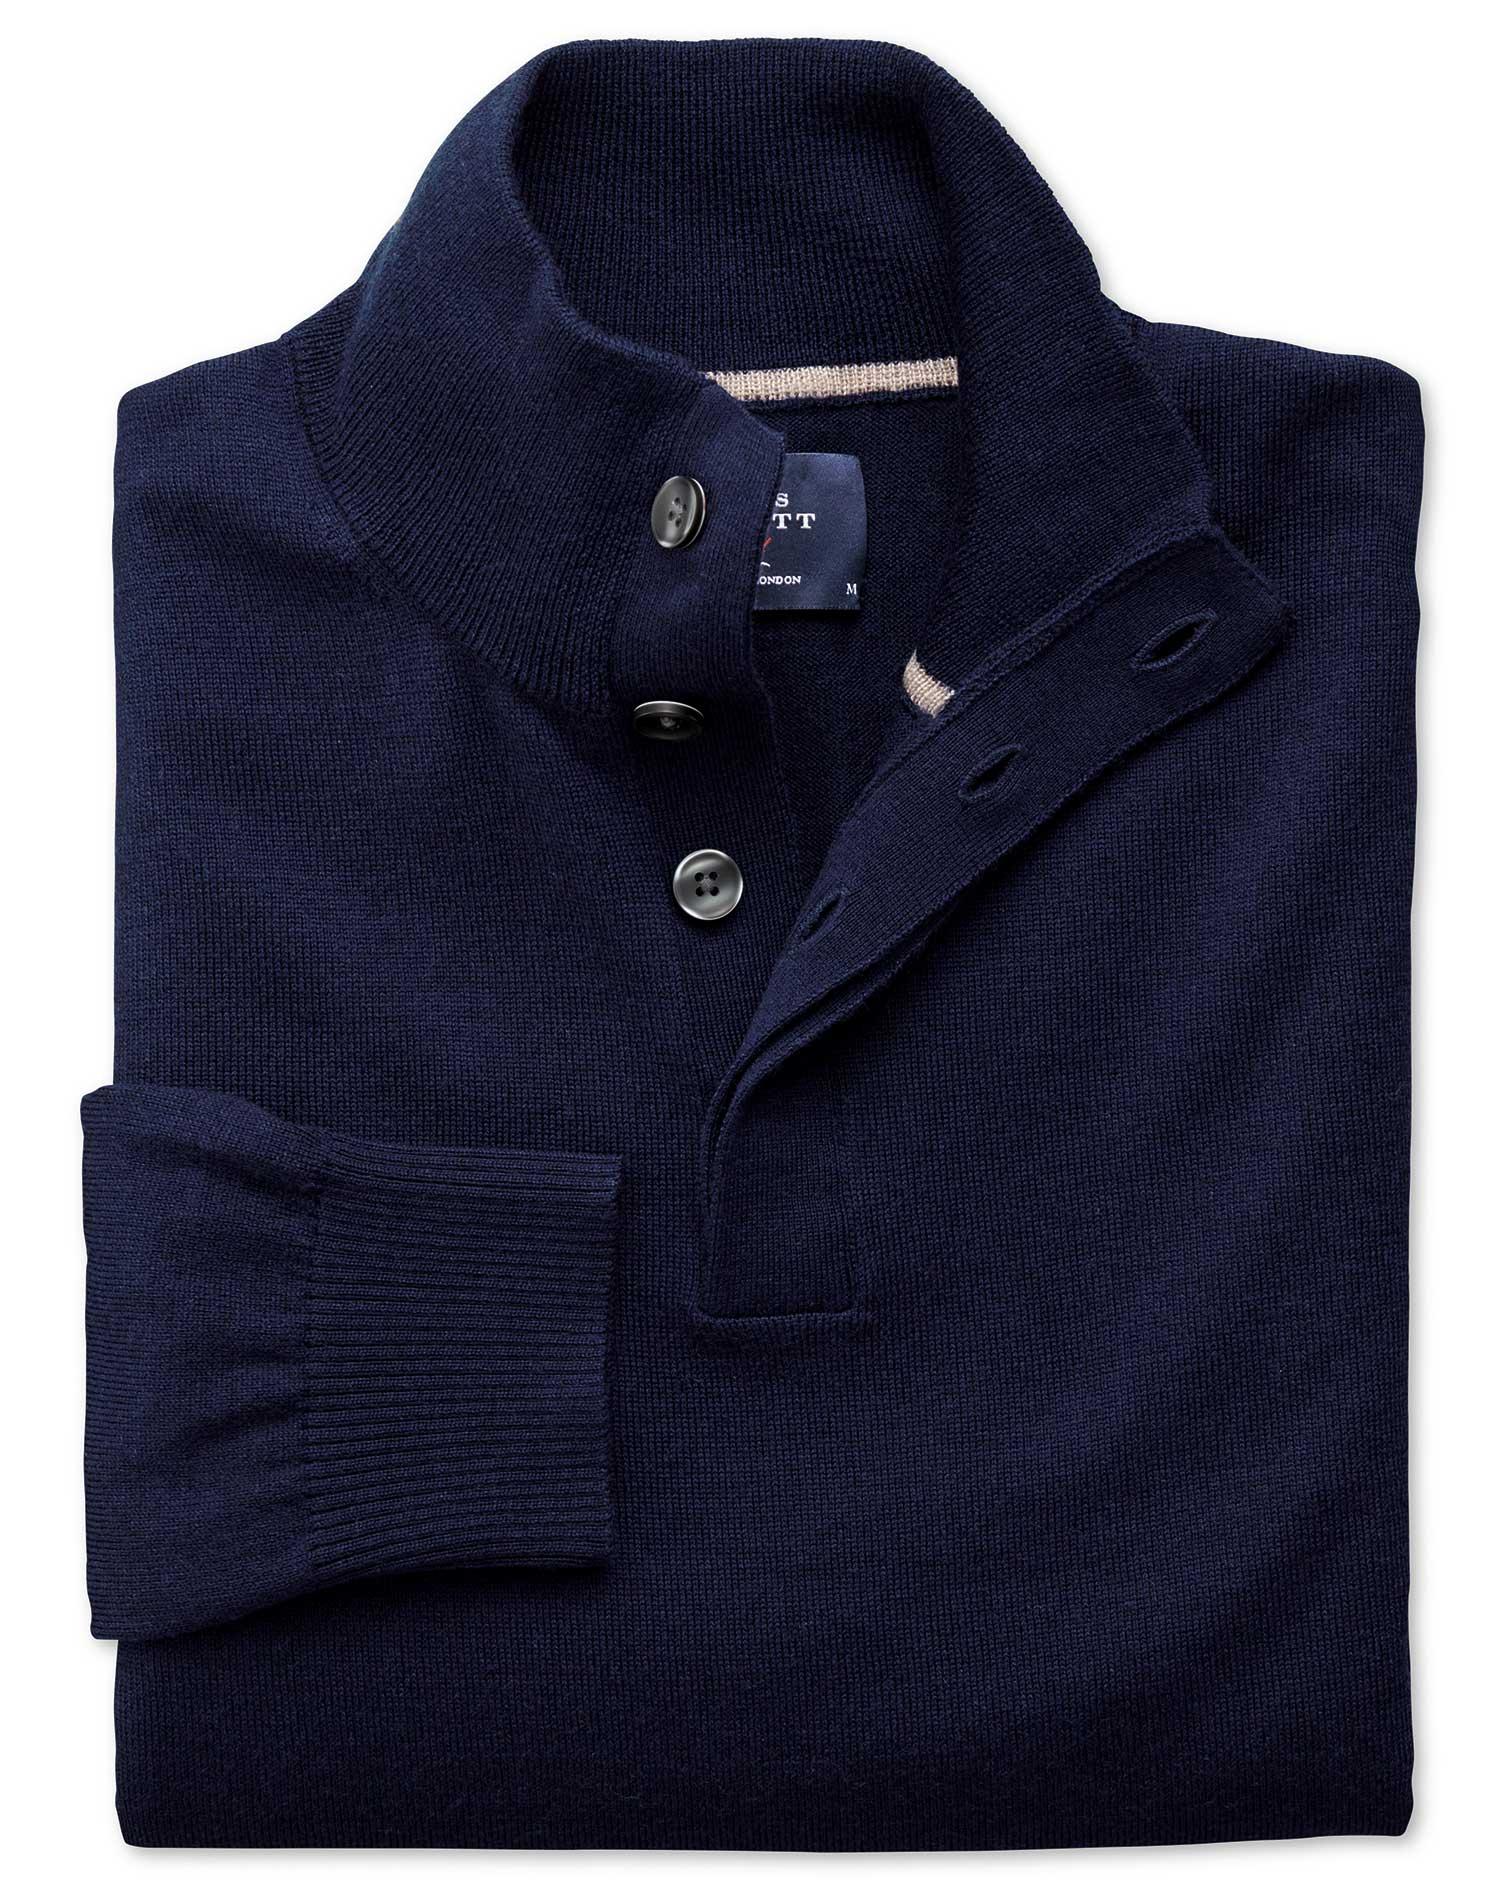 Navy Merino Wool Button Neck Jumper Size Small by Charles Tyrwhitt